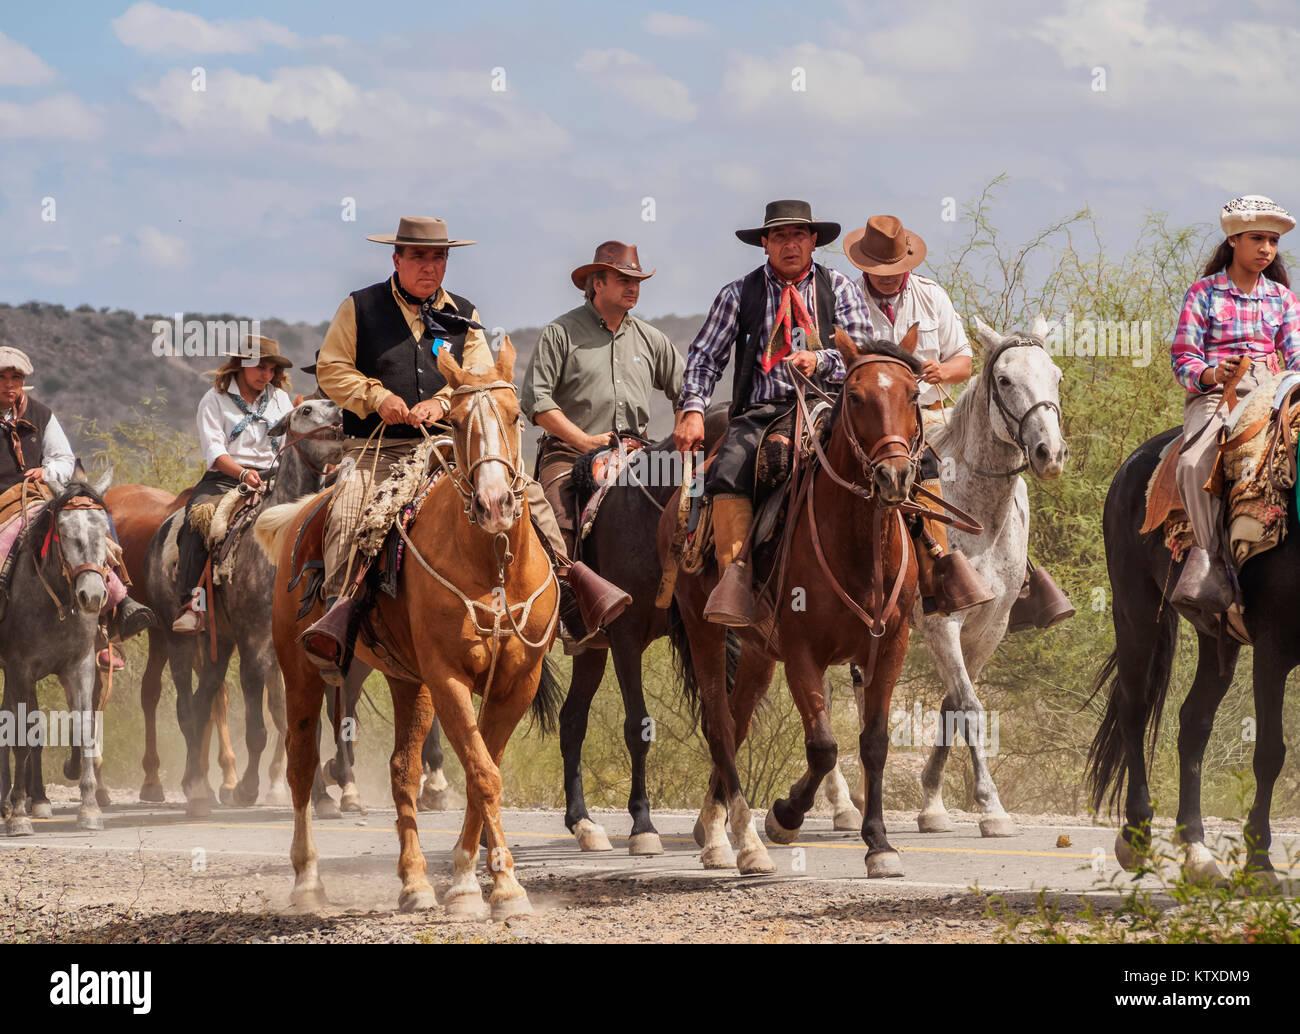 Cabalgata de Los Gauchos, Gaucho horse parade from San Juan to Vallecito, San Juan Province, Argentina, South America - Stock Image